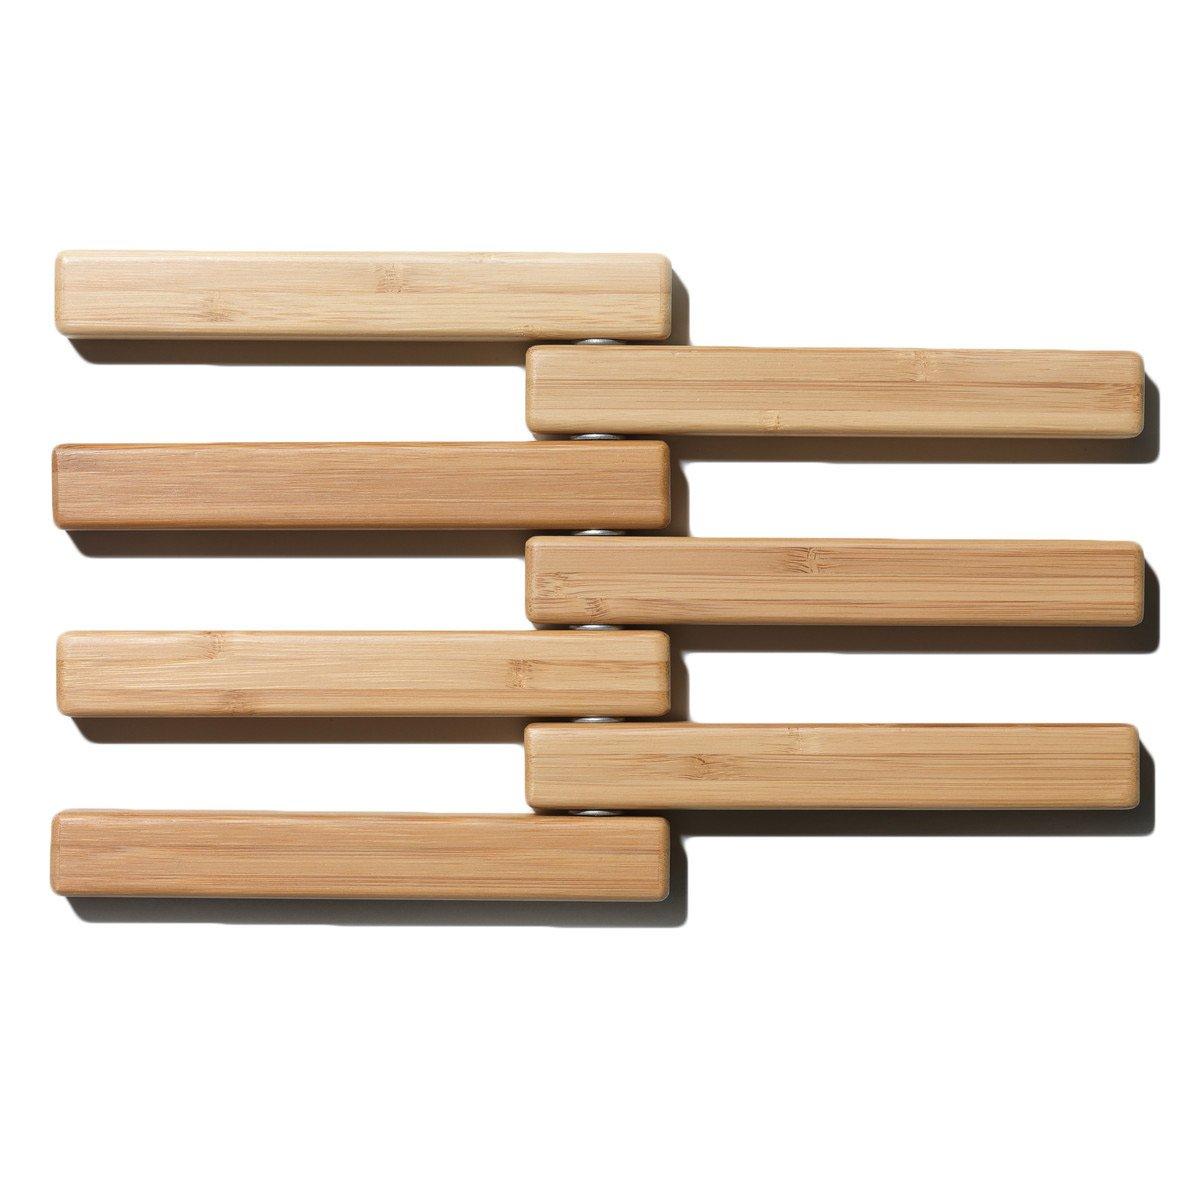 bamboo hot pot expandable trivet. Black Bedroom Furniture Sets. Home Design Ideas